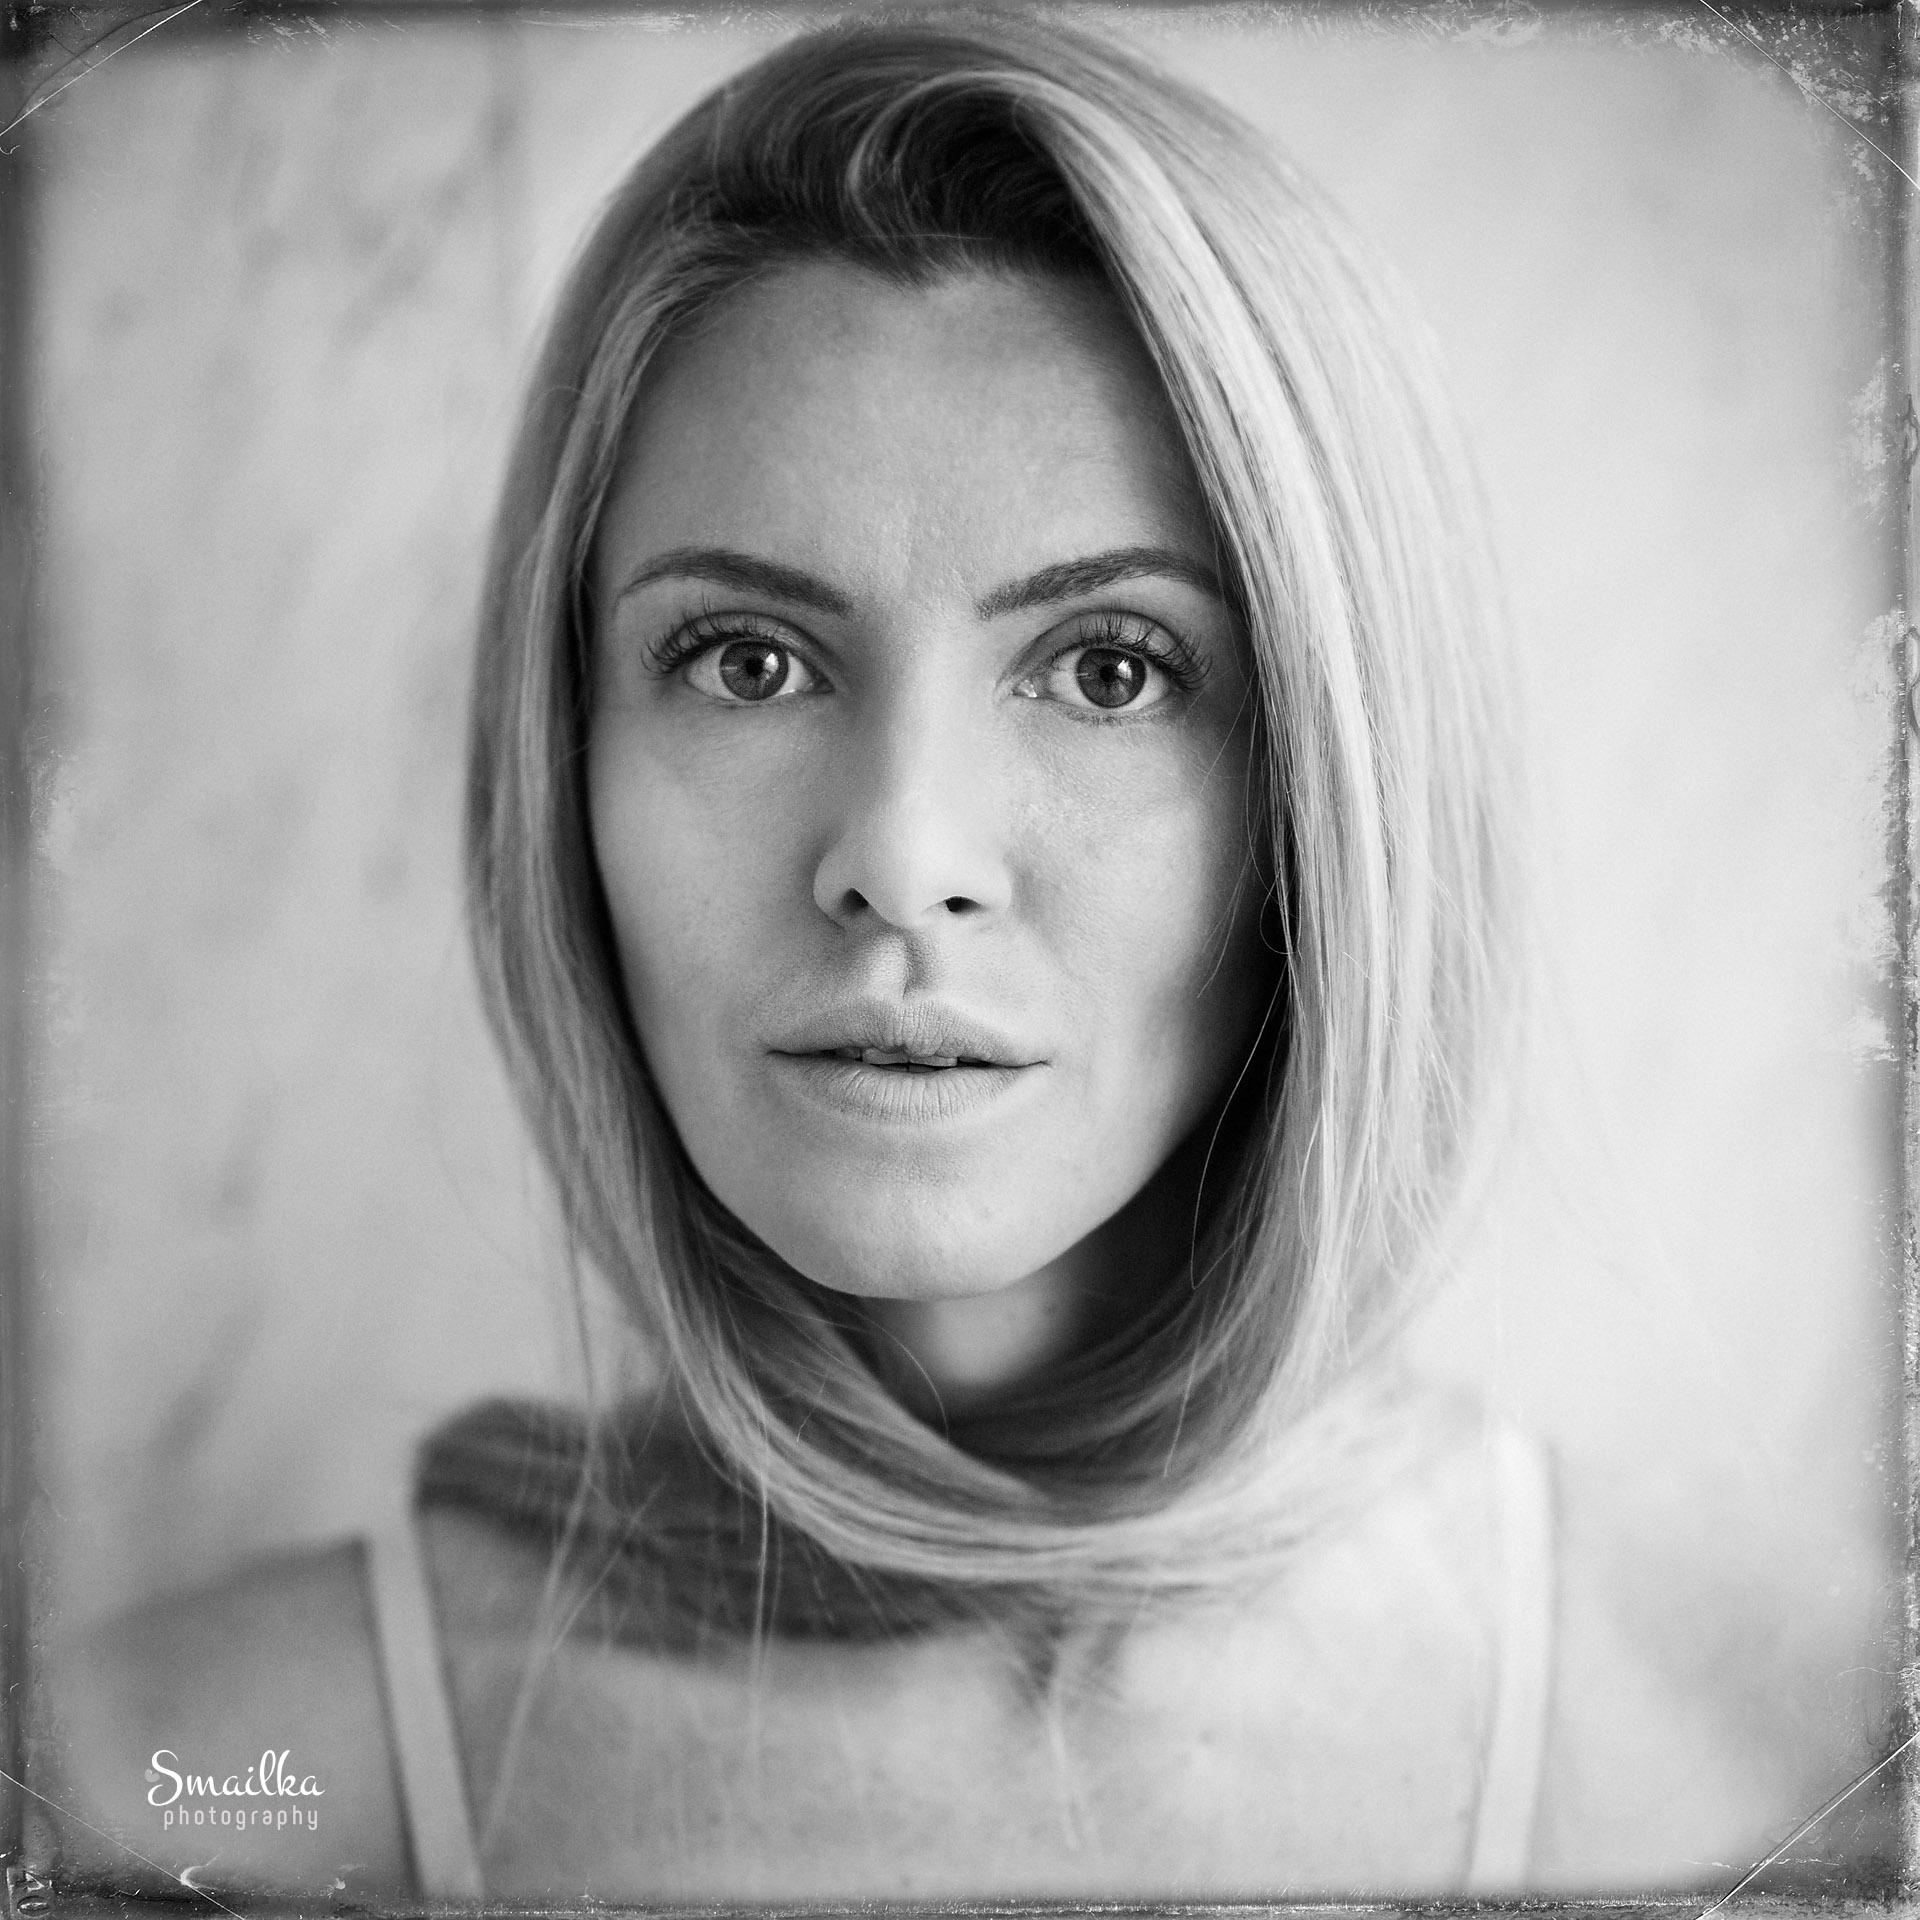 Yanica Dobrich, portrait of a woman